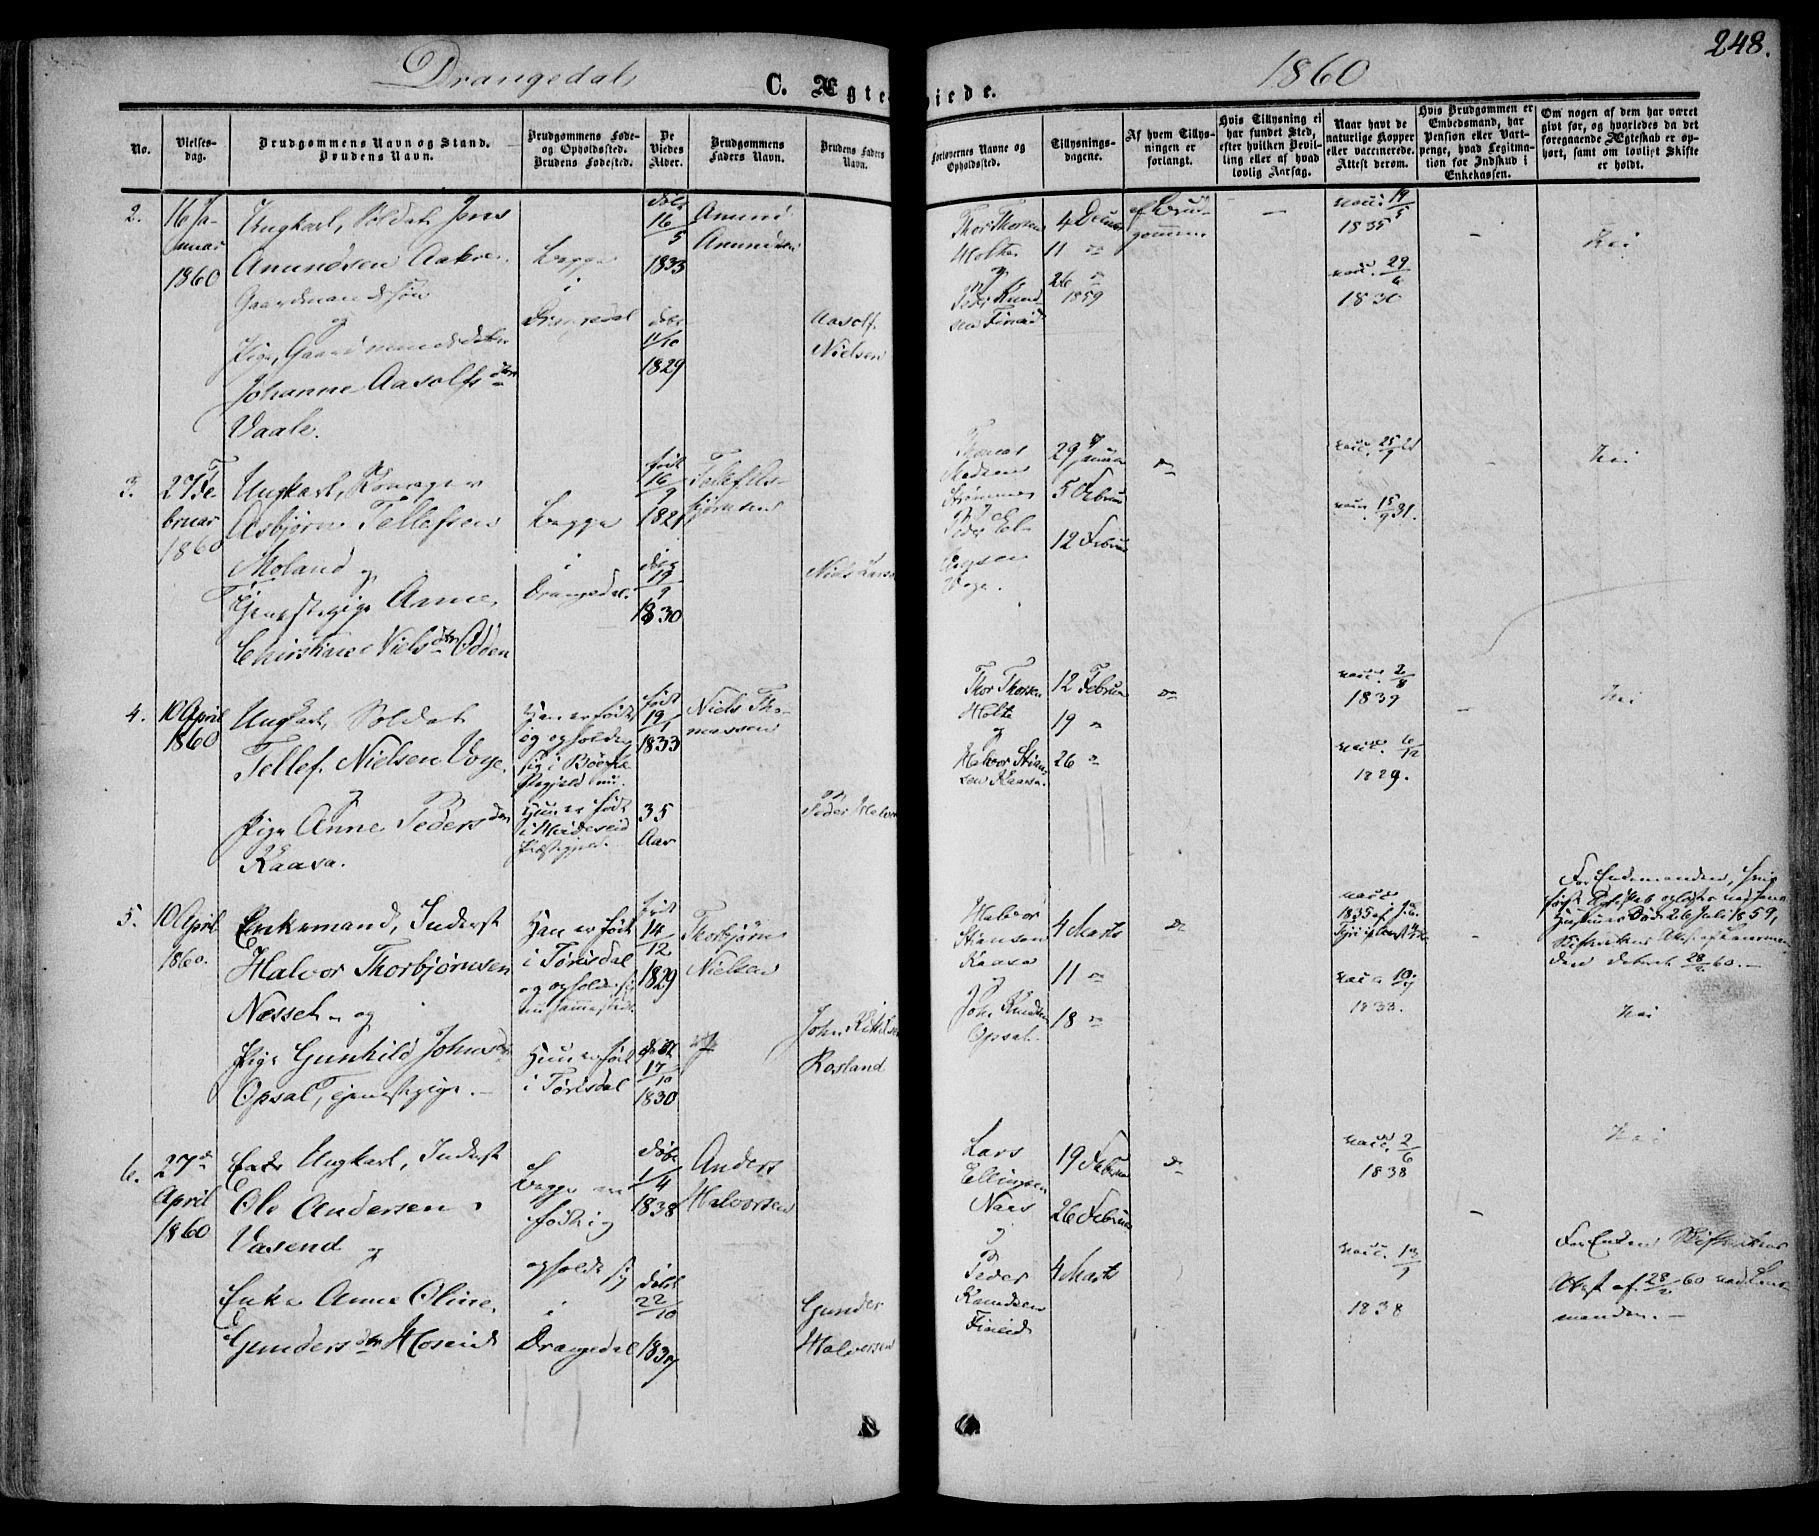 SAKO, Drangedal kirkebøker, F/Fa/L0008: Ministerialbok nr. 8, 1857-1871, s. 248